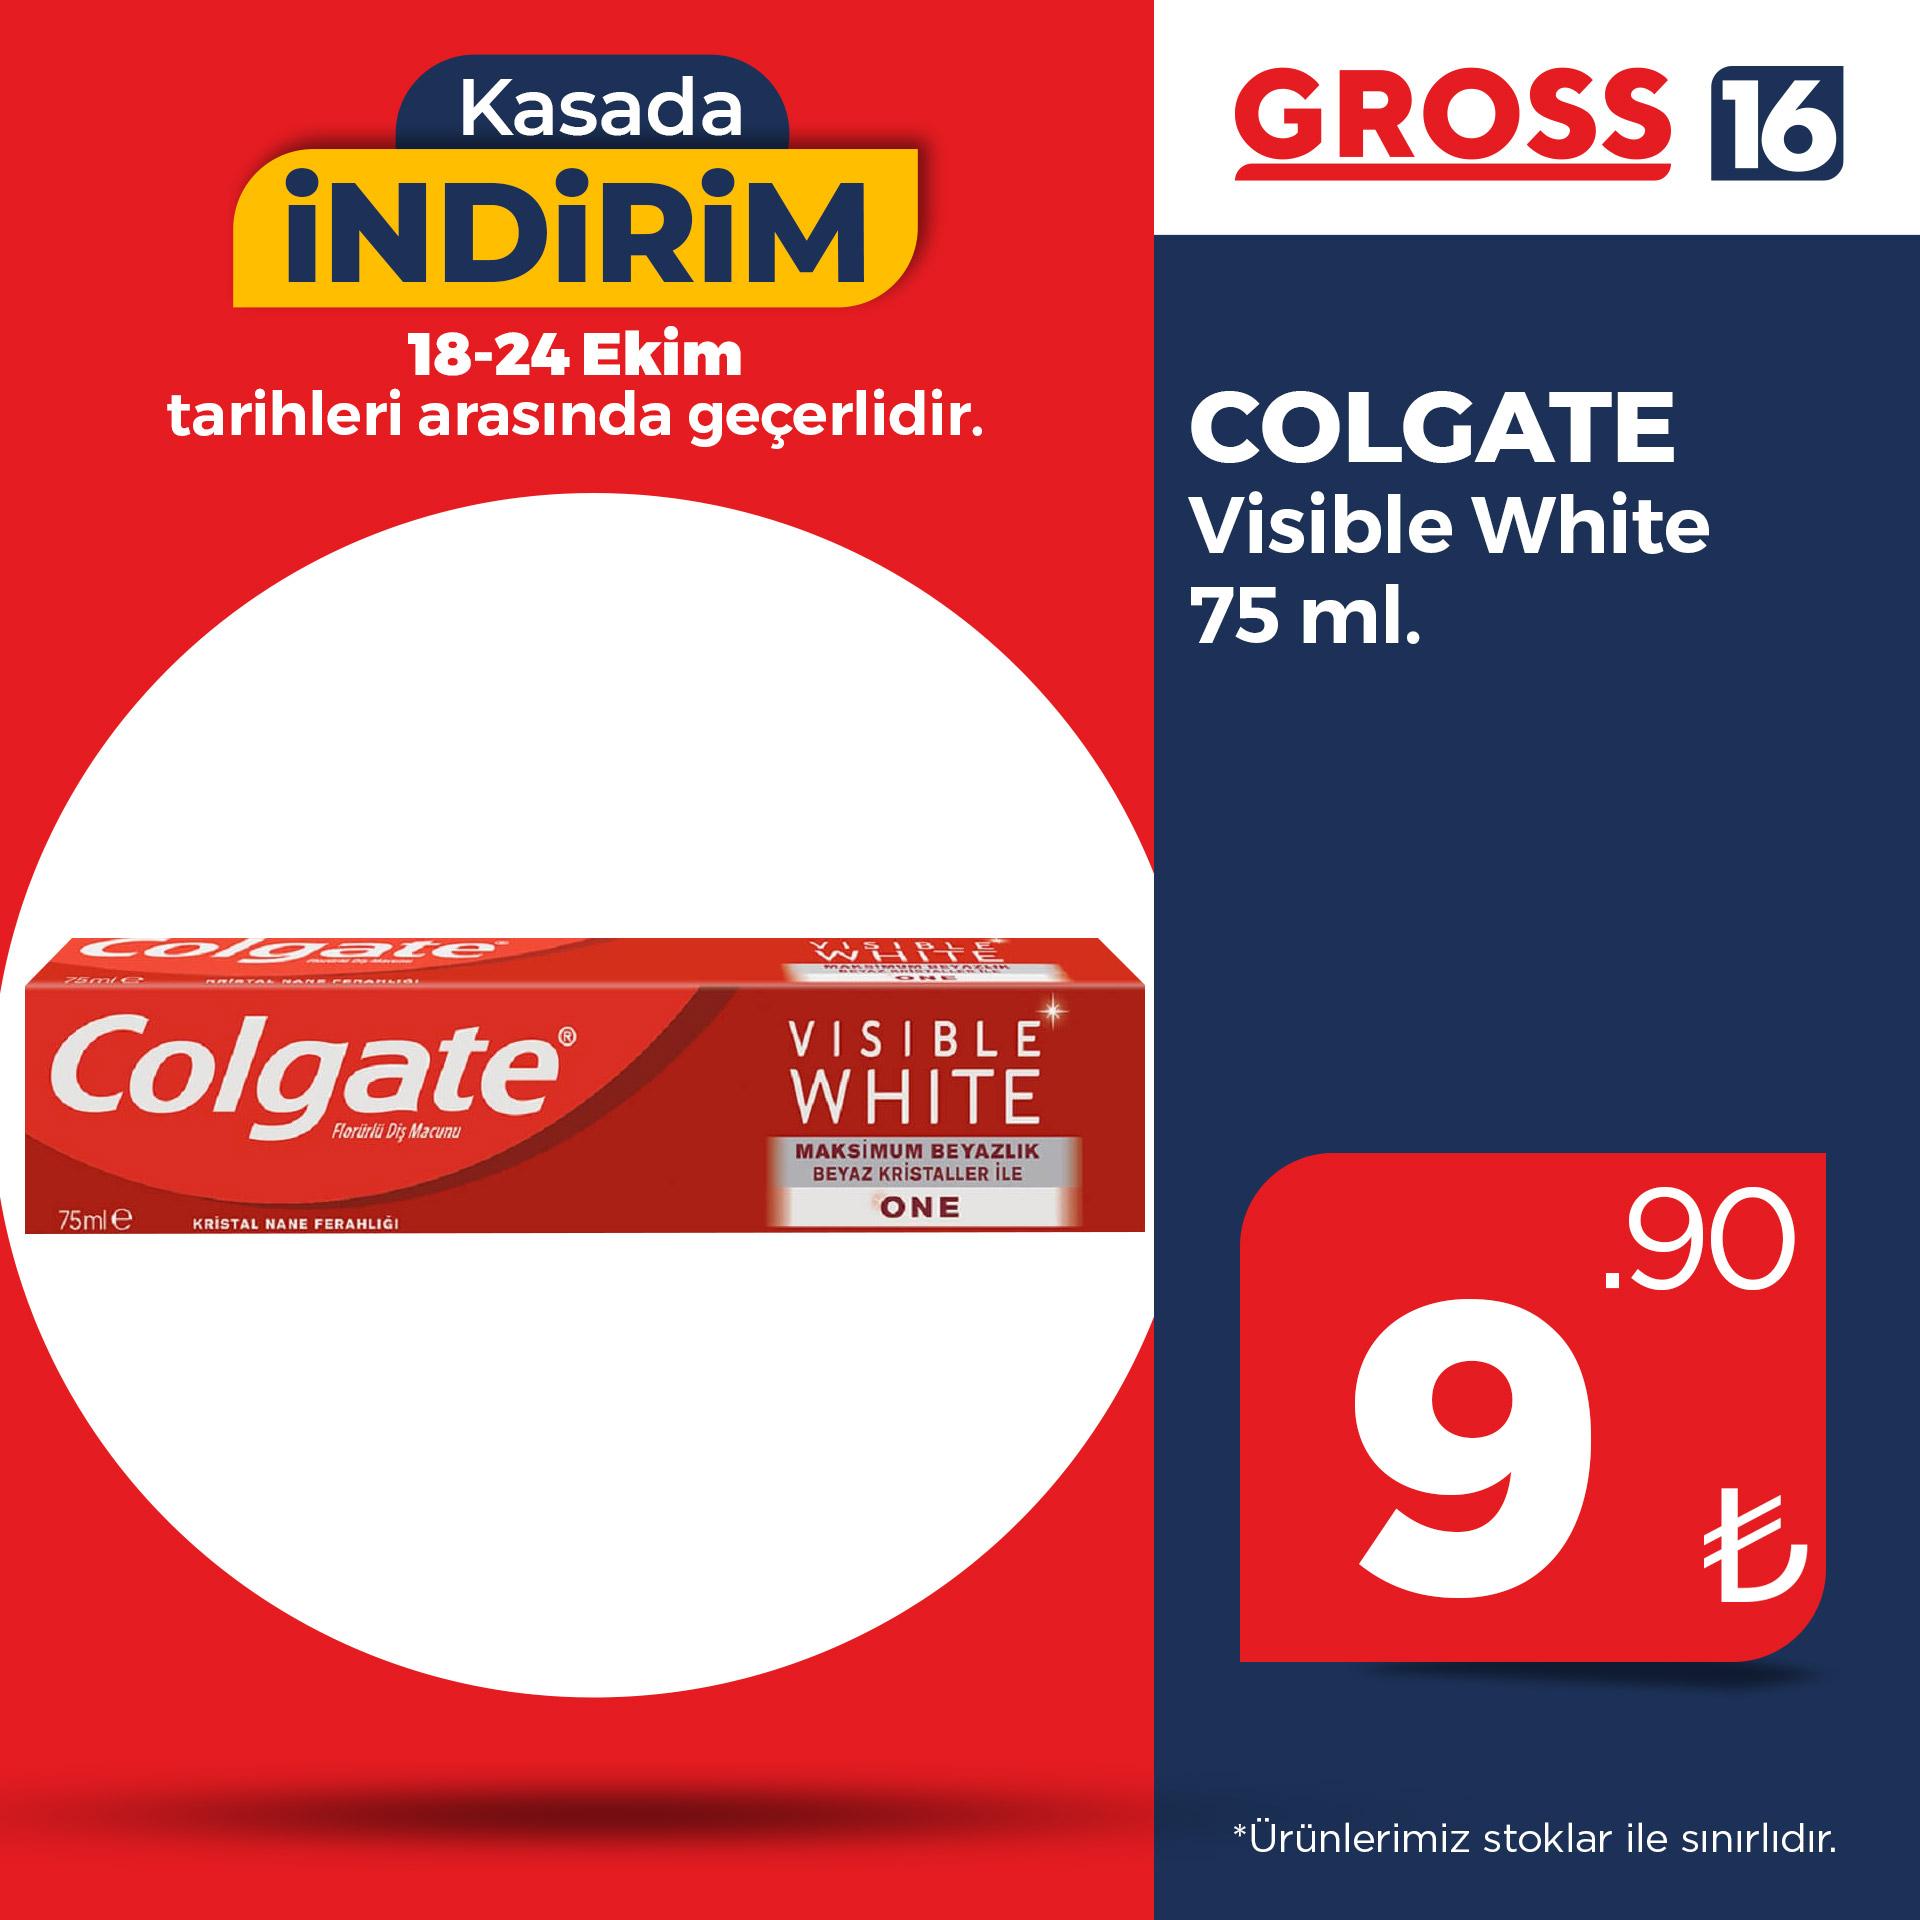 COLGATE VISIBLE WHITE 75 ML.